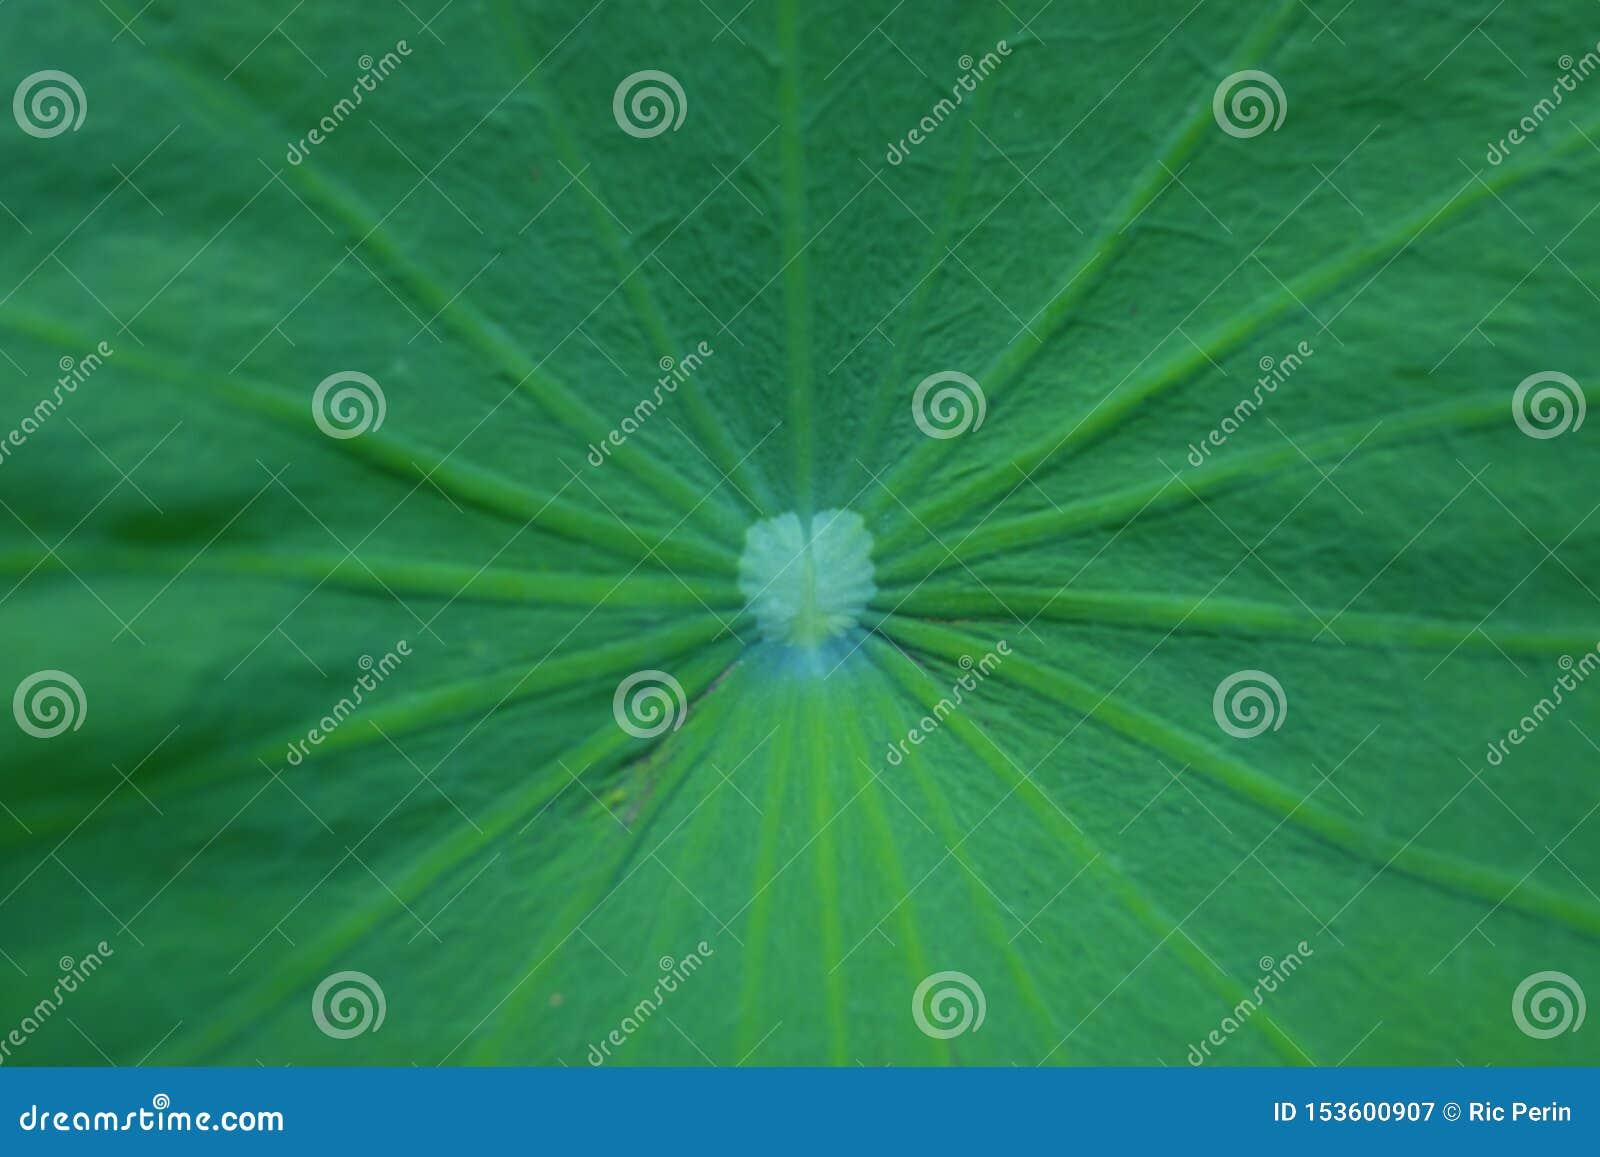 Lotus Leaf Close Up sagrado